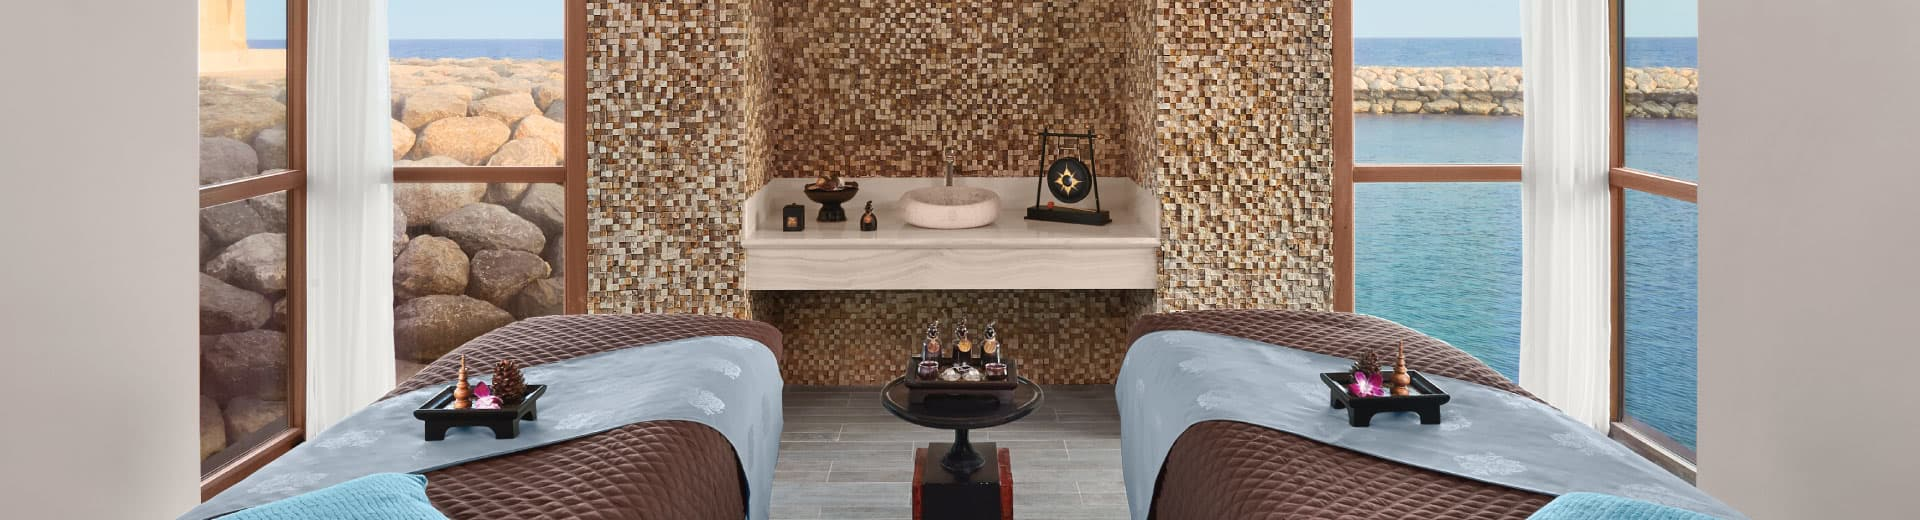 Couple Massage Room at Banana Island Resort Doha